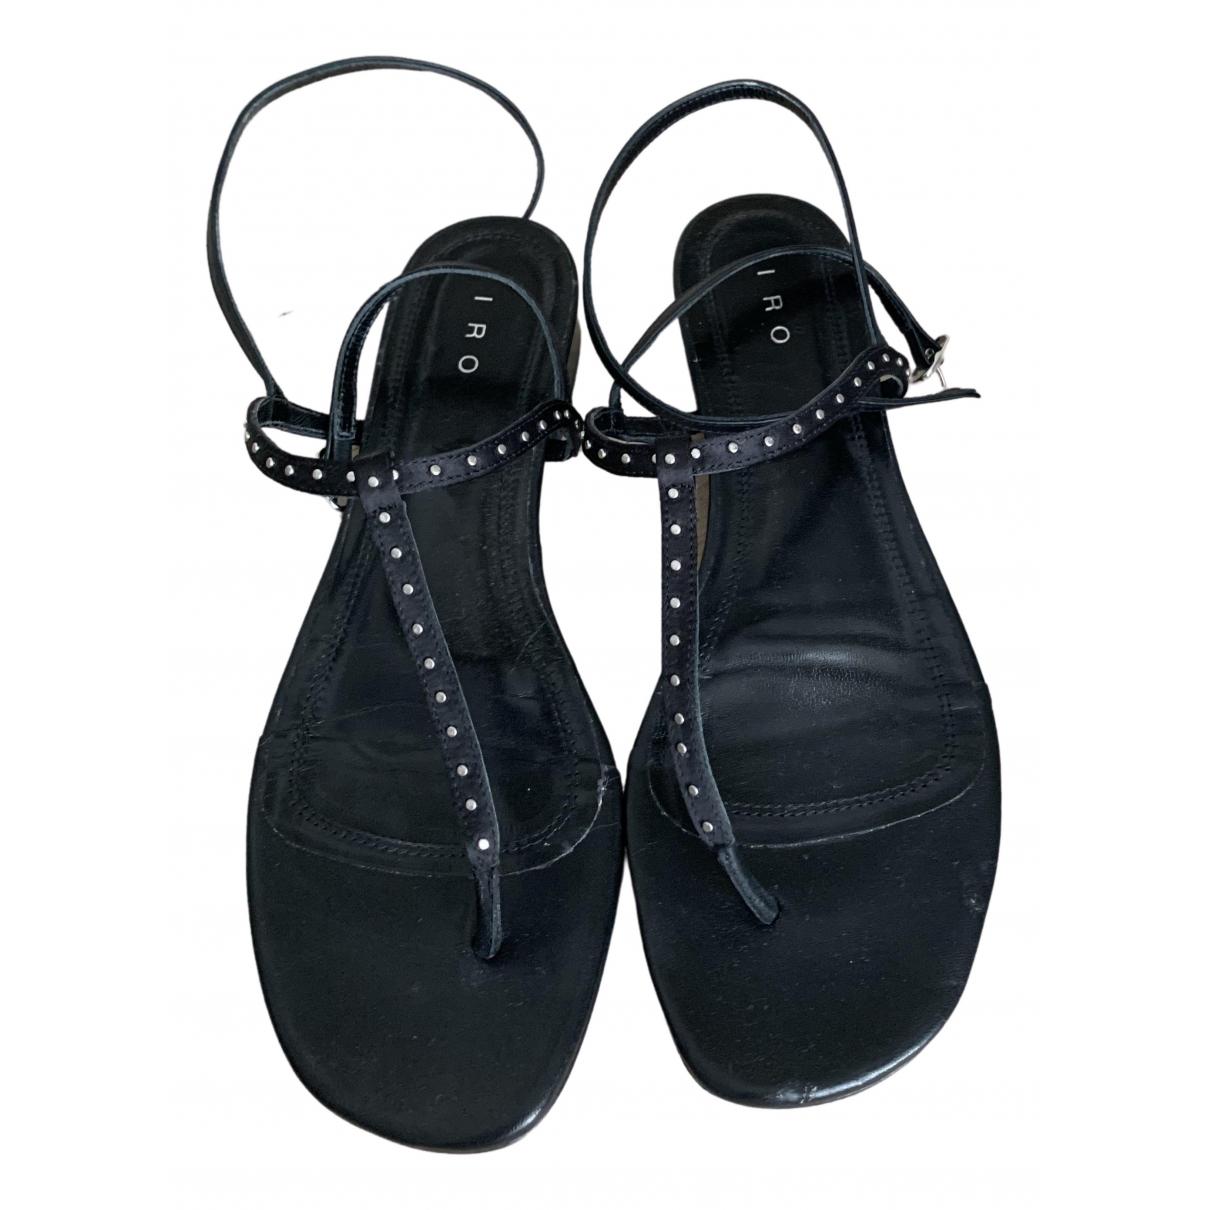 Iro Spring Summer 2020 Black Leather Sandals for Women 38 EU